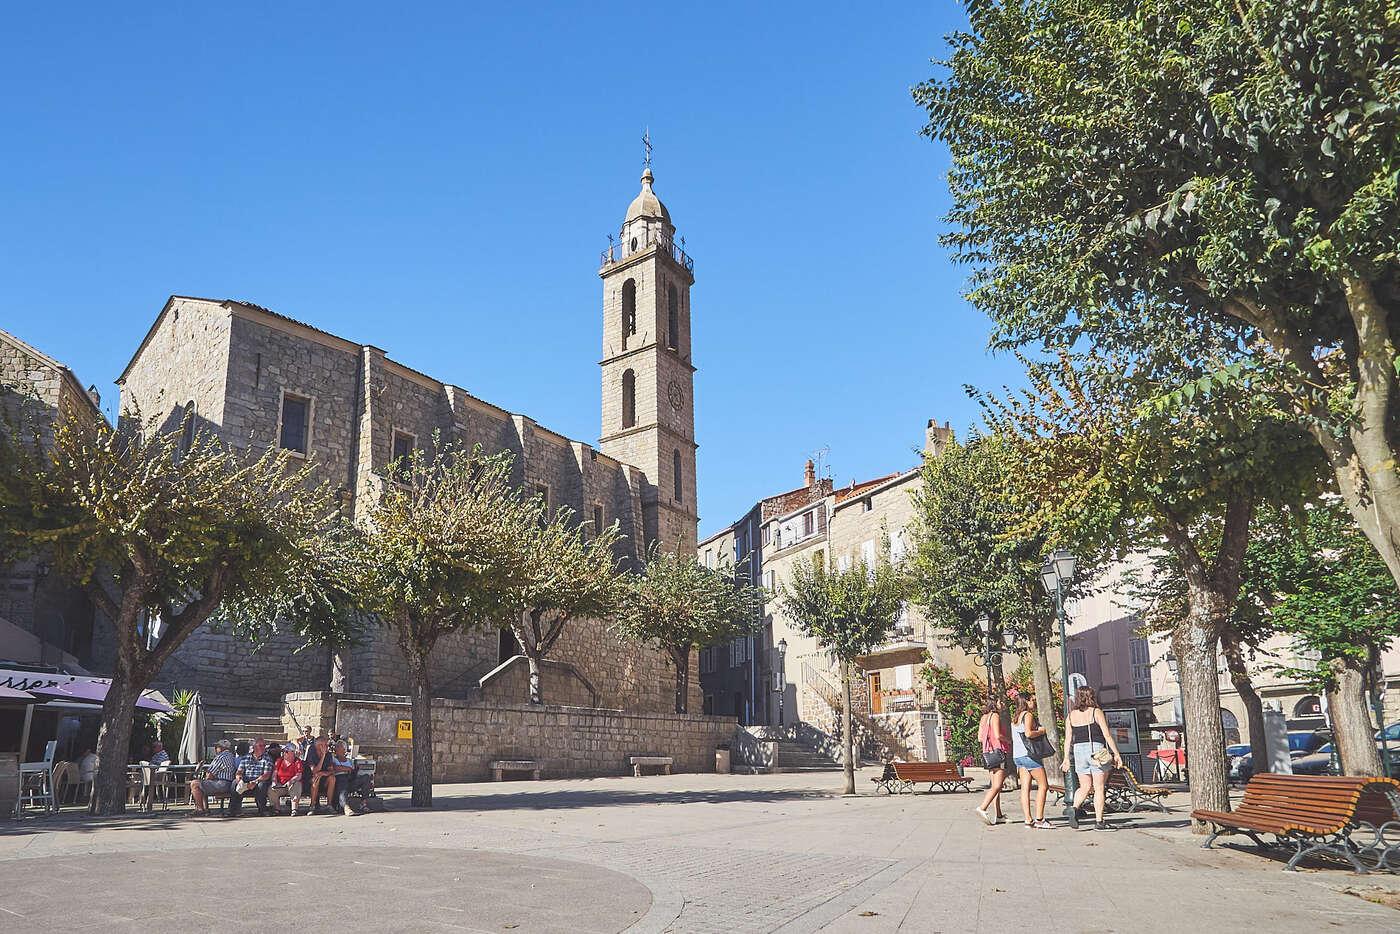 Eglise de Sartène, Corse